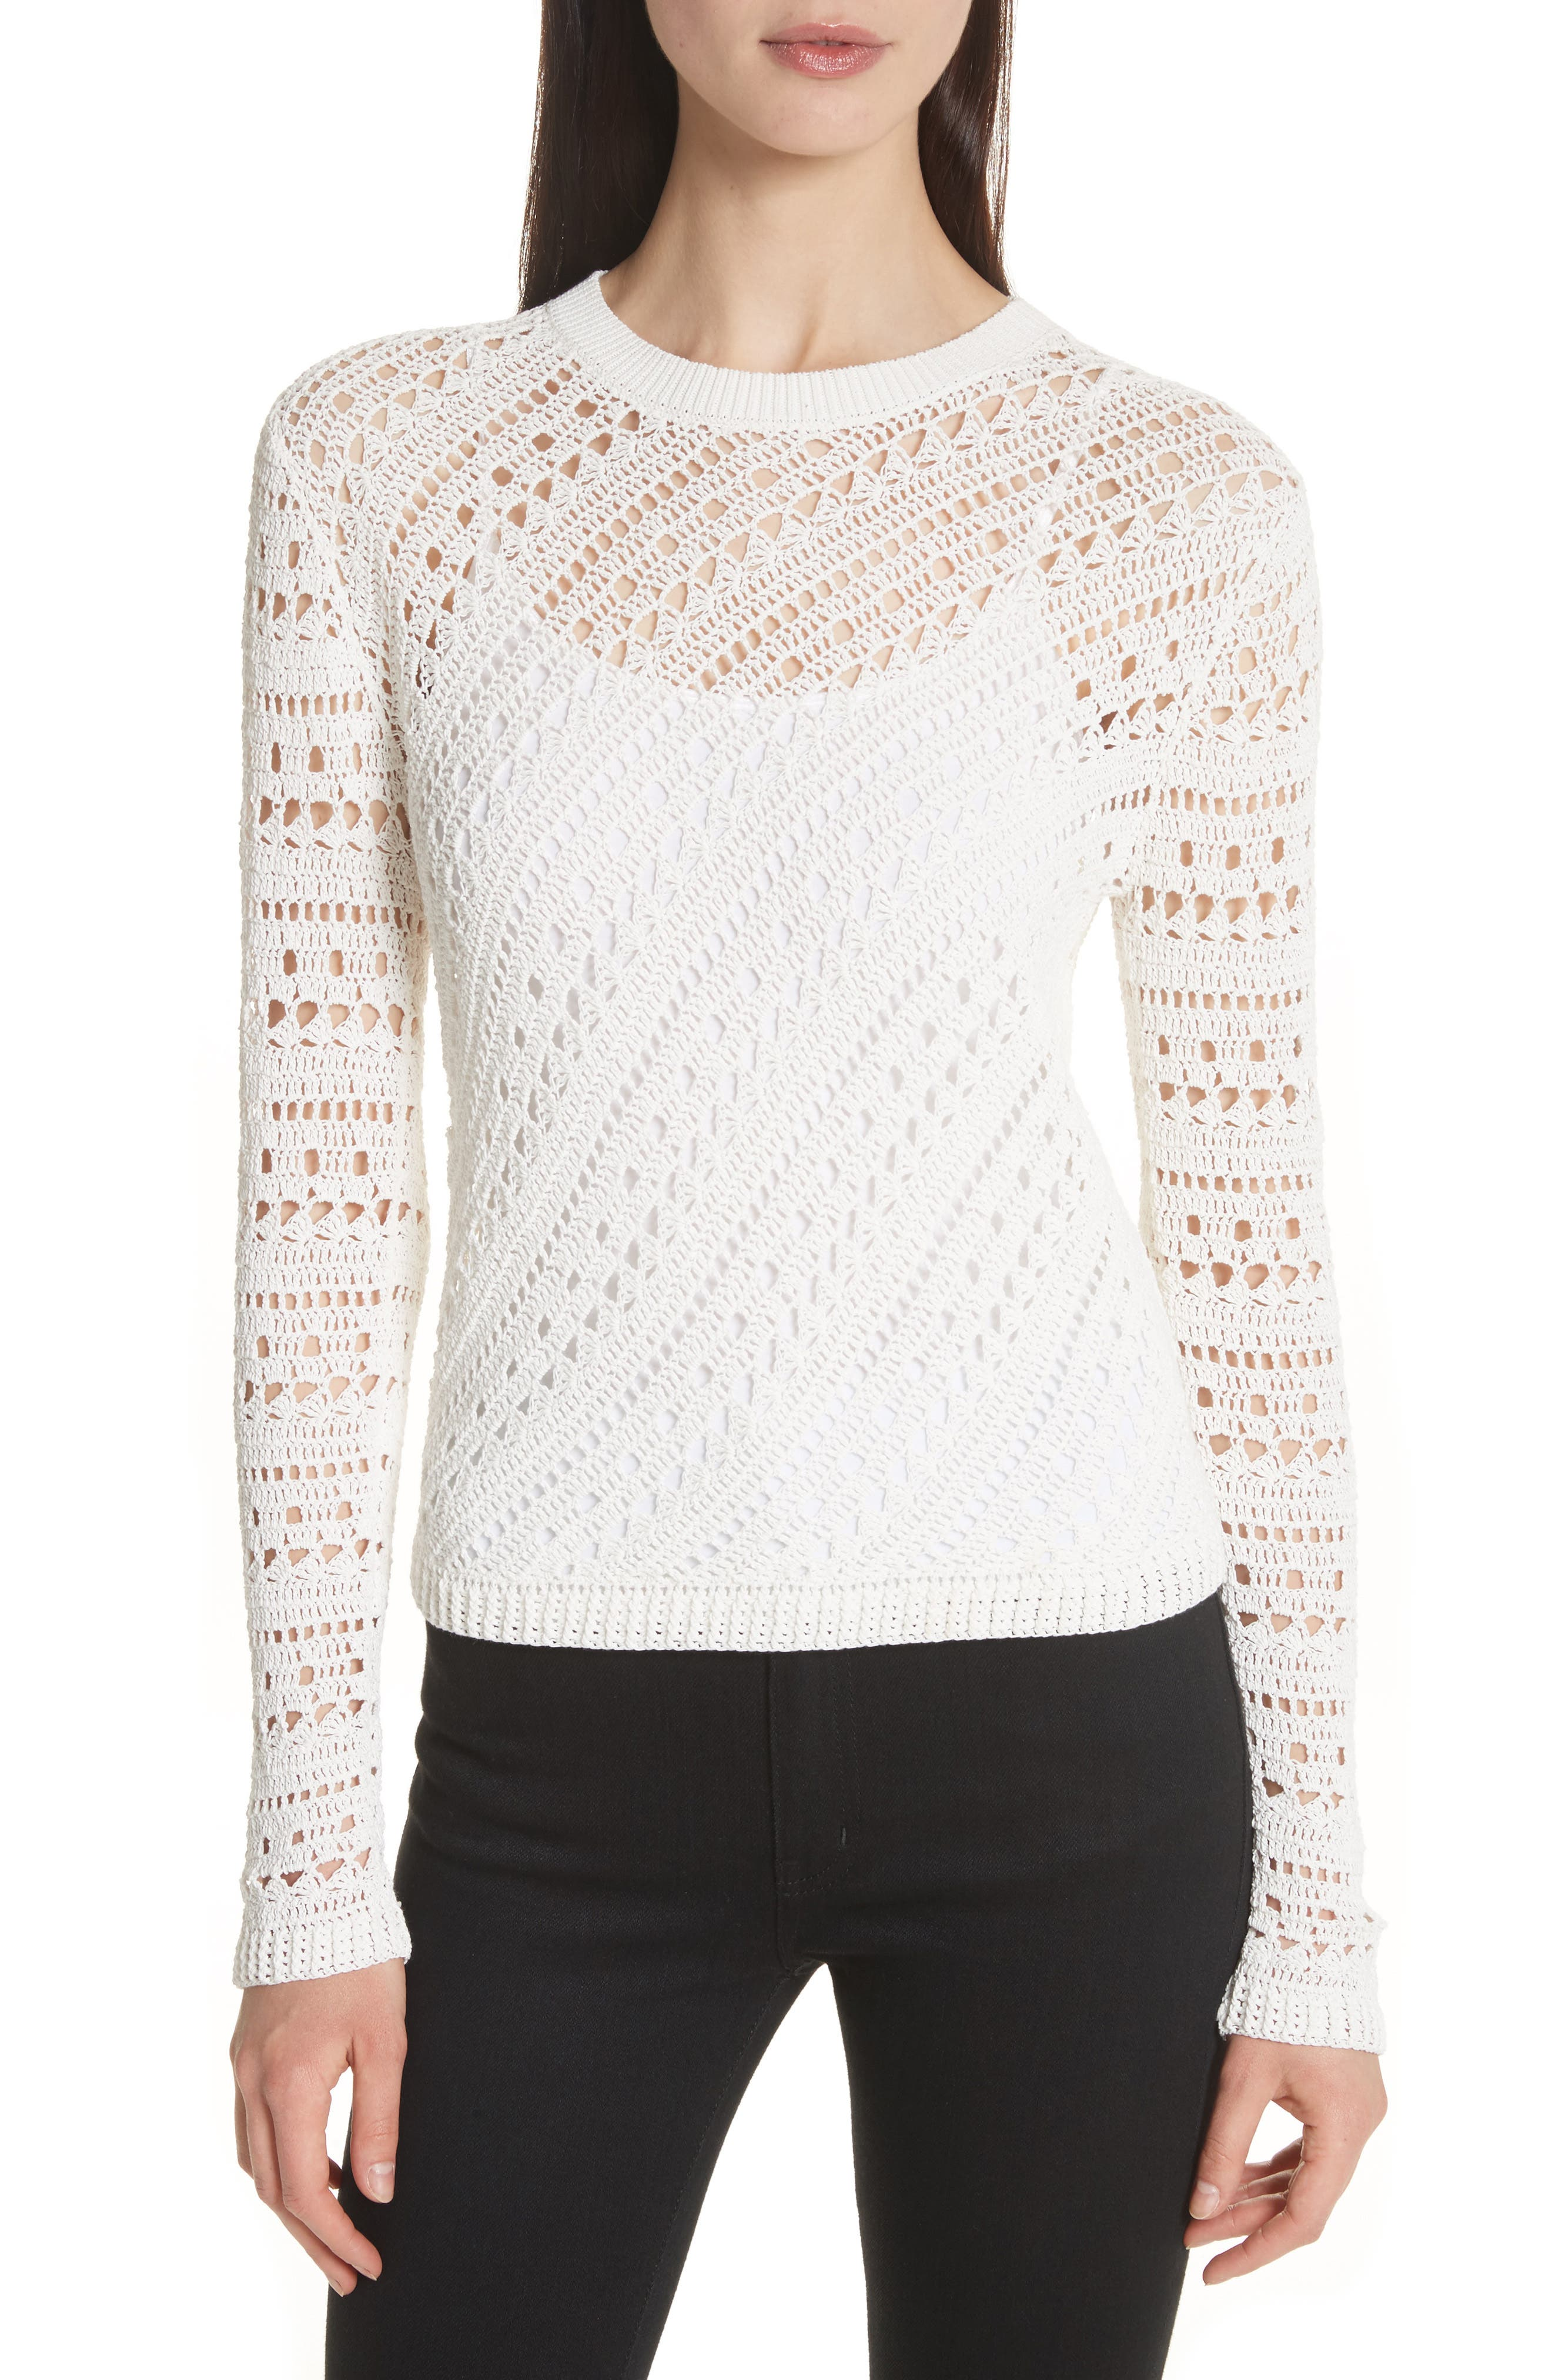 Theory Woman Cotton-blend Sweater Pink Size L Theory Discount Free Shipping Choice Cheap Price Sale Amazon Cheap Sale 2018 Cheap For Cheap ljsnrA